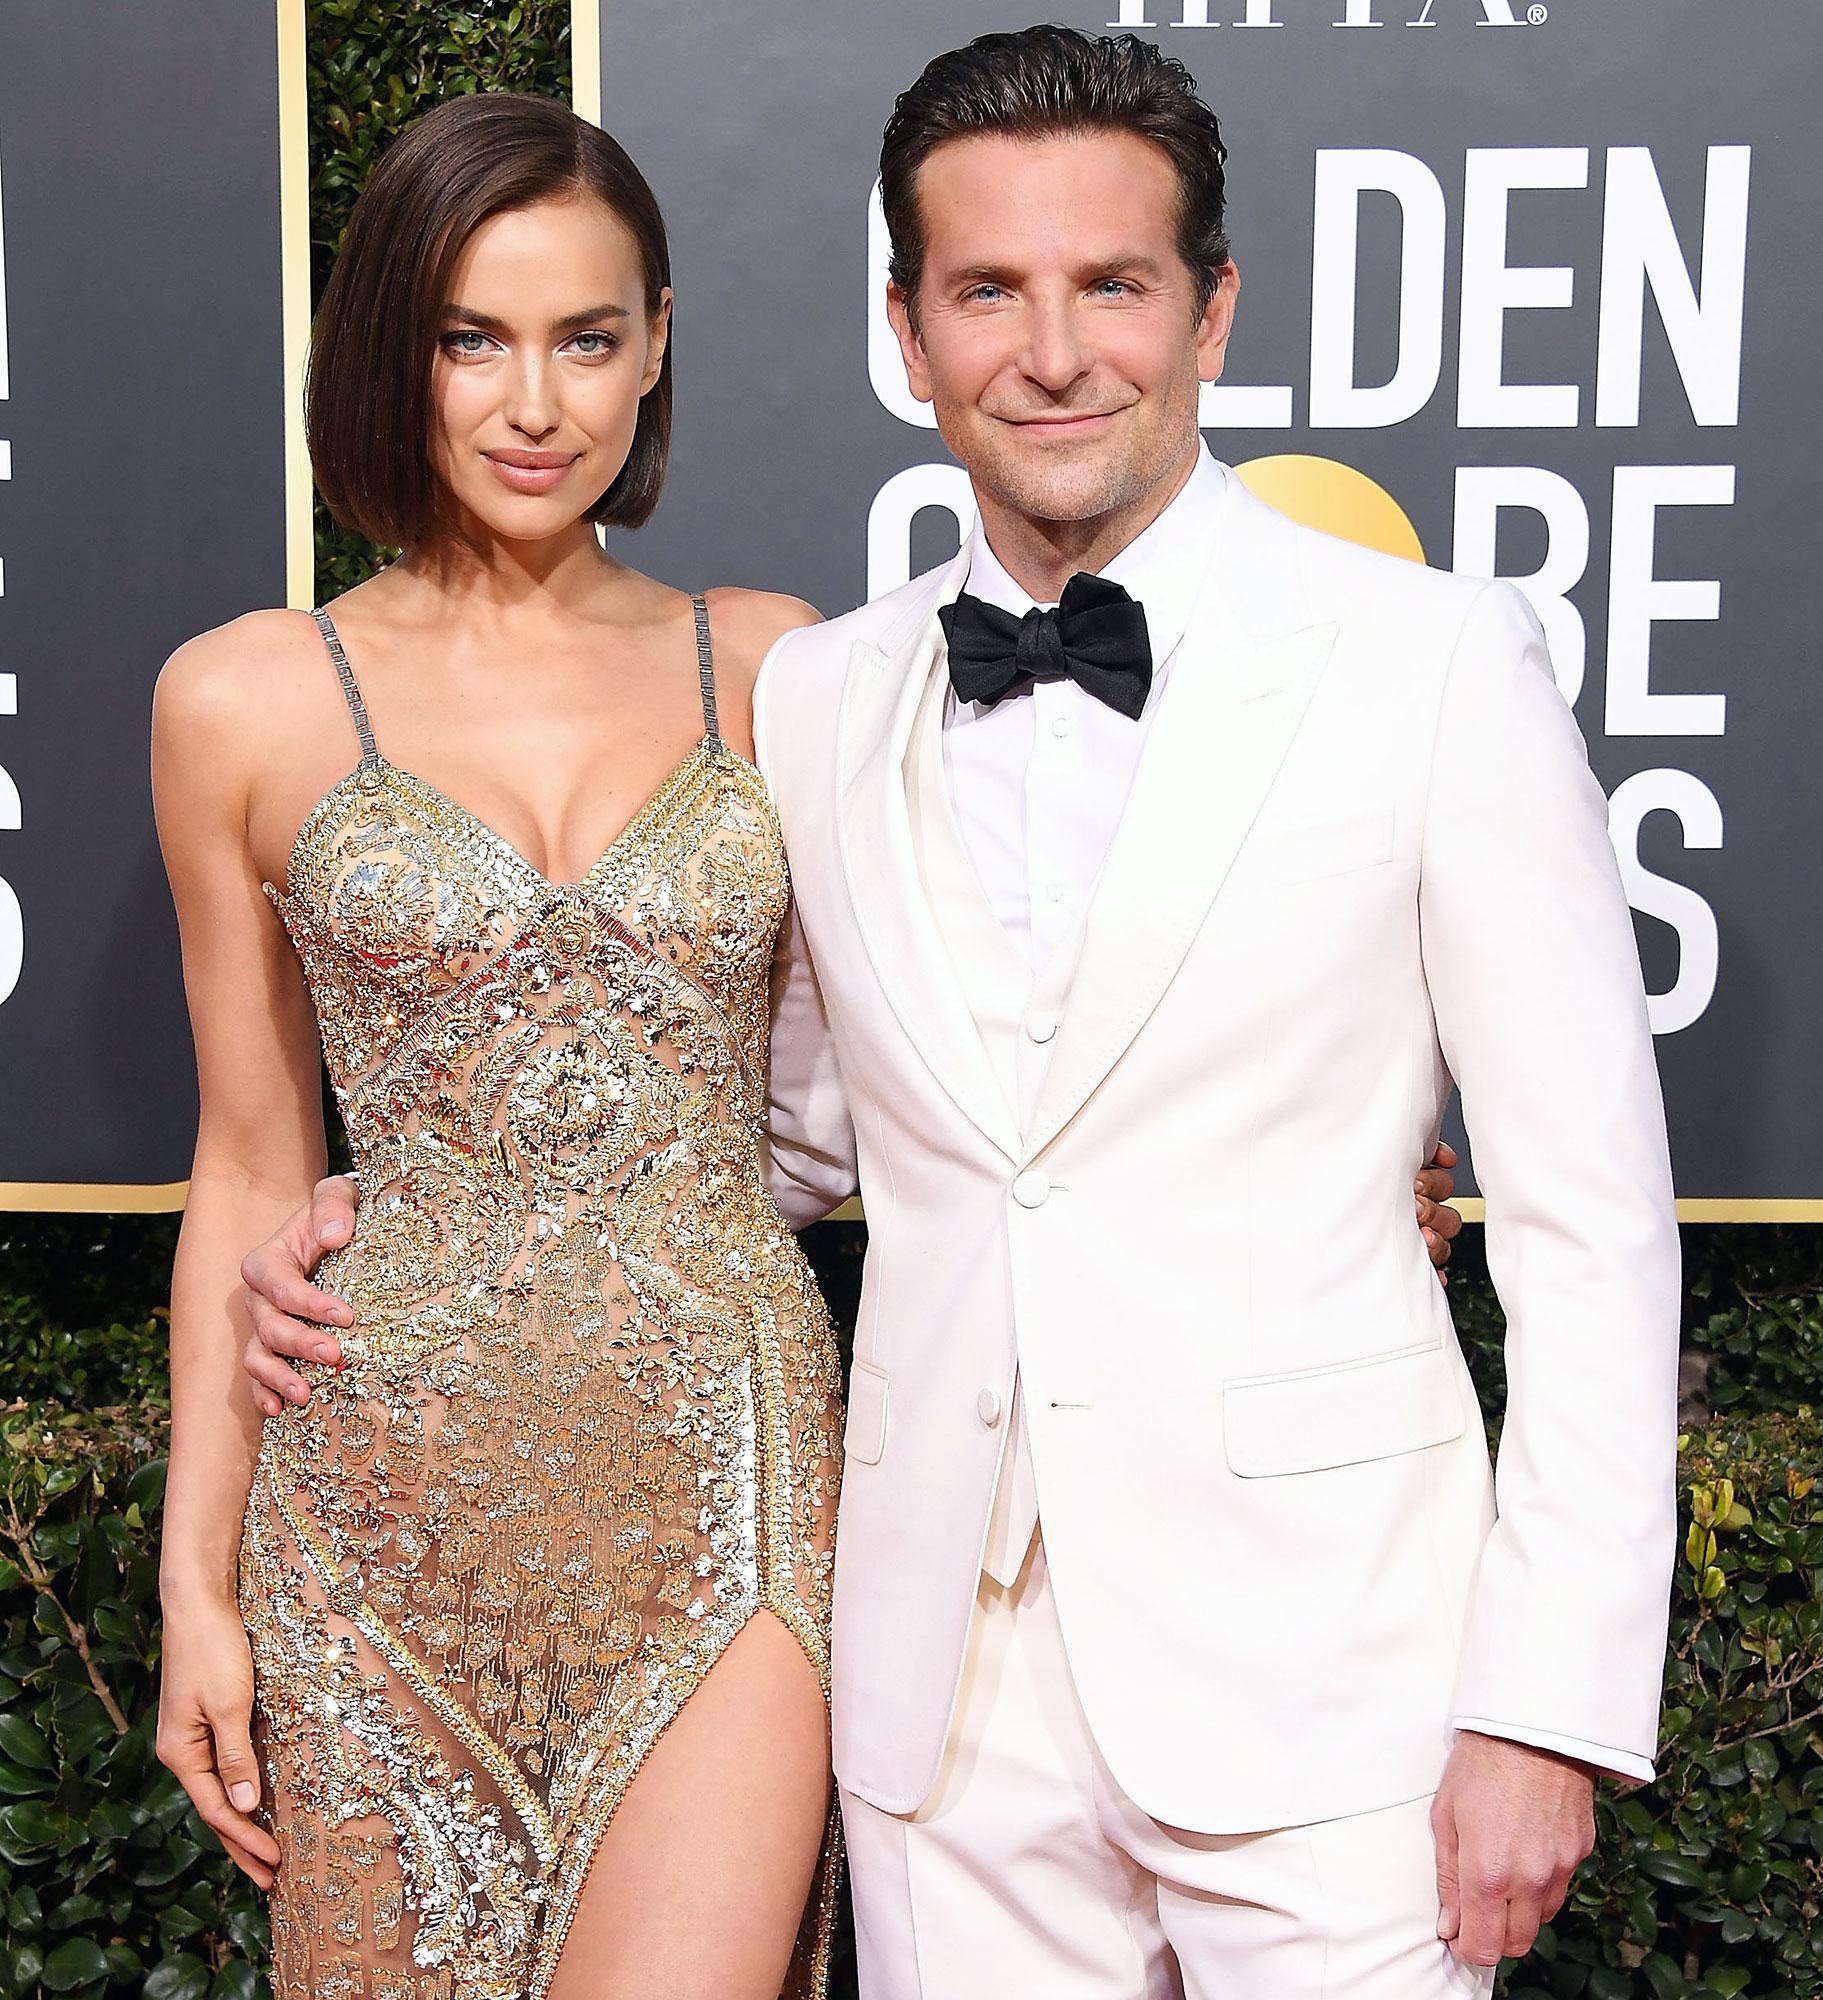 Irina Shayk and Bradley Cooper arrive at the Golden Globe Awards